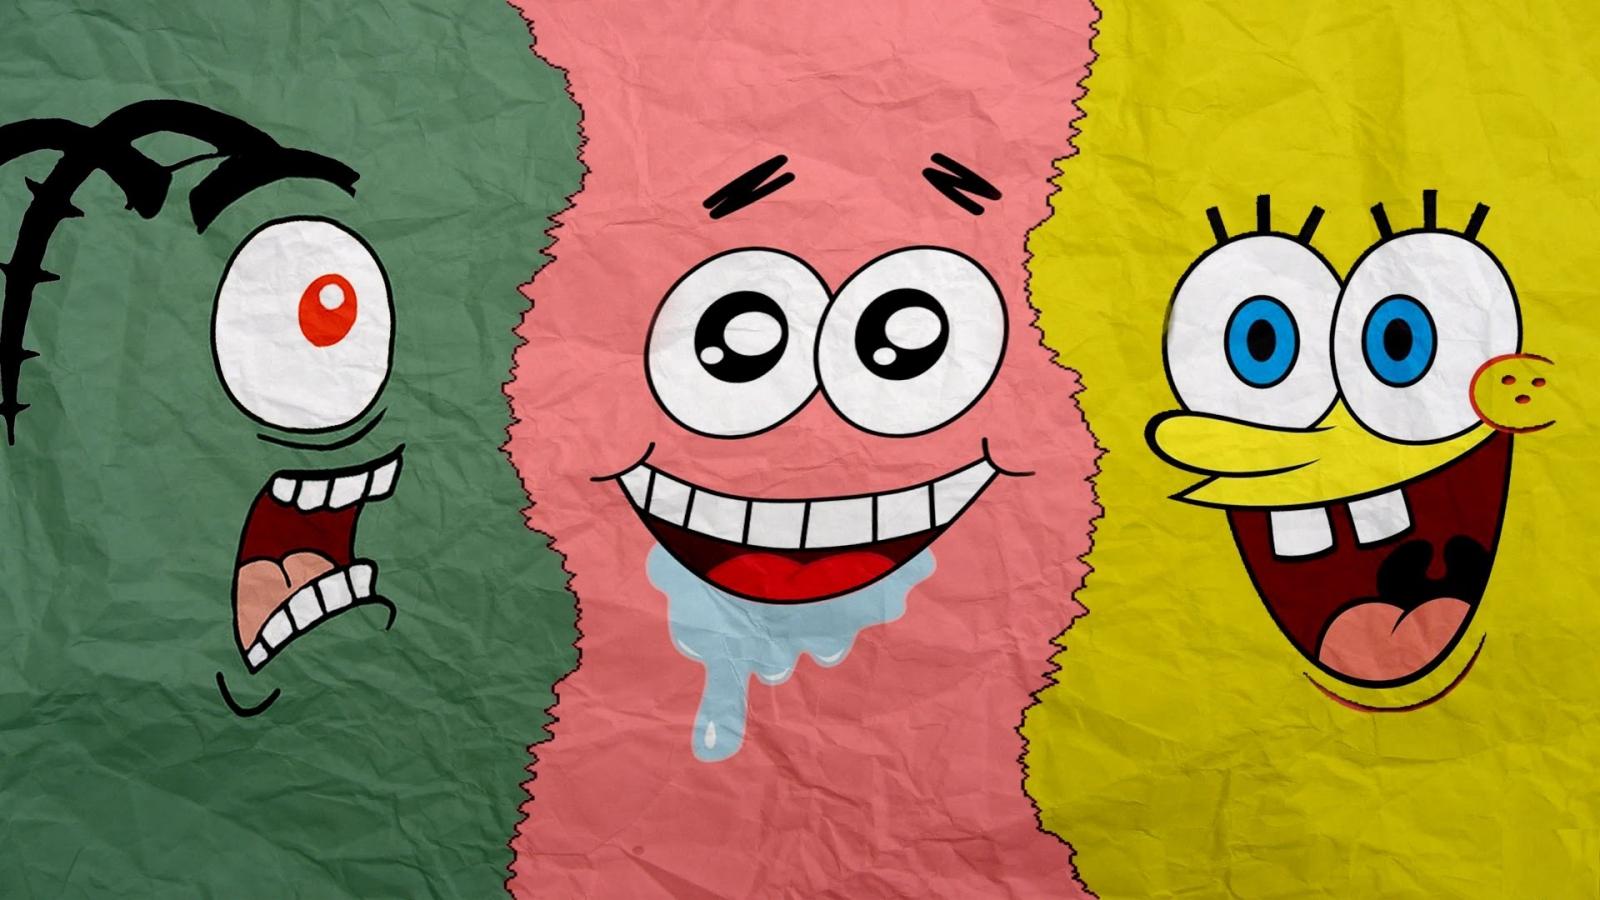 Free Download Cute Spongebob Wallpaper Hd 1920x1080 For Your Desktop Mobile Tablet Explore 73 Spongebob Desktop Wallpaper Spongebob Squarepants Wallpaper Spongebob Hd Wallpaper Spongebob Screensavers And Wallpaper